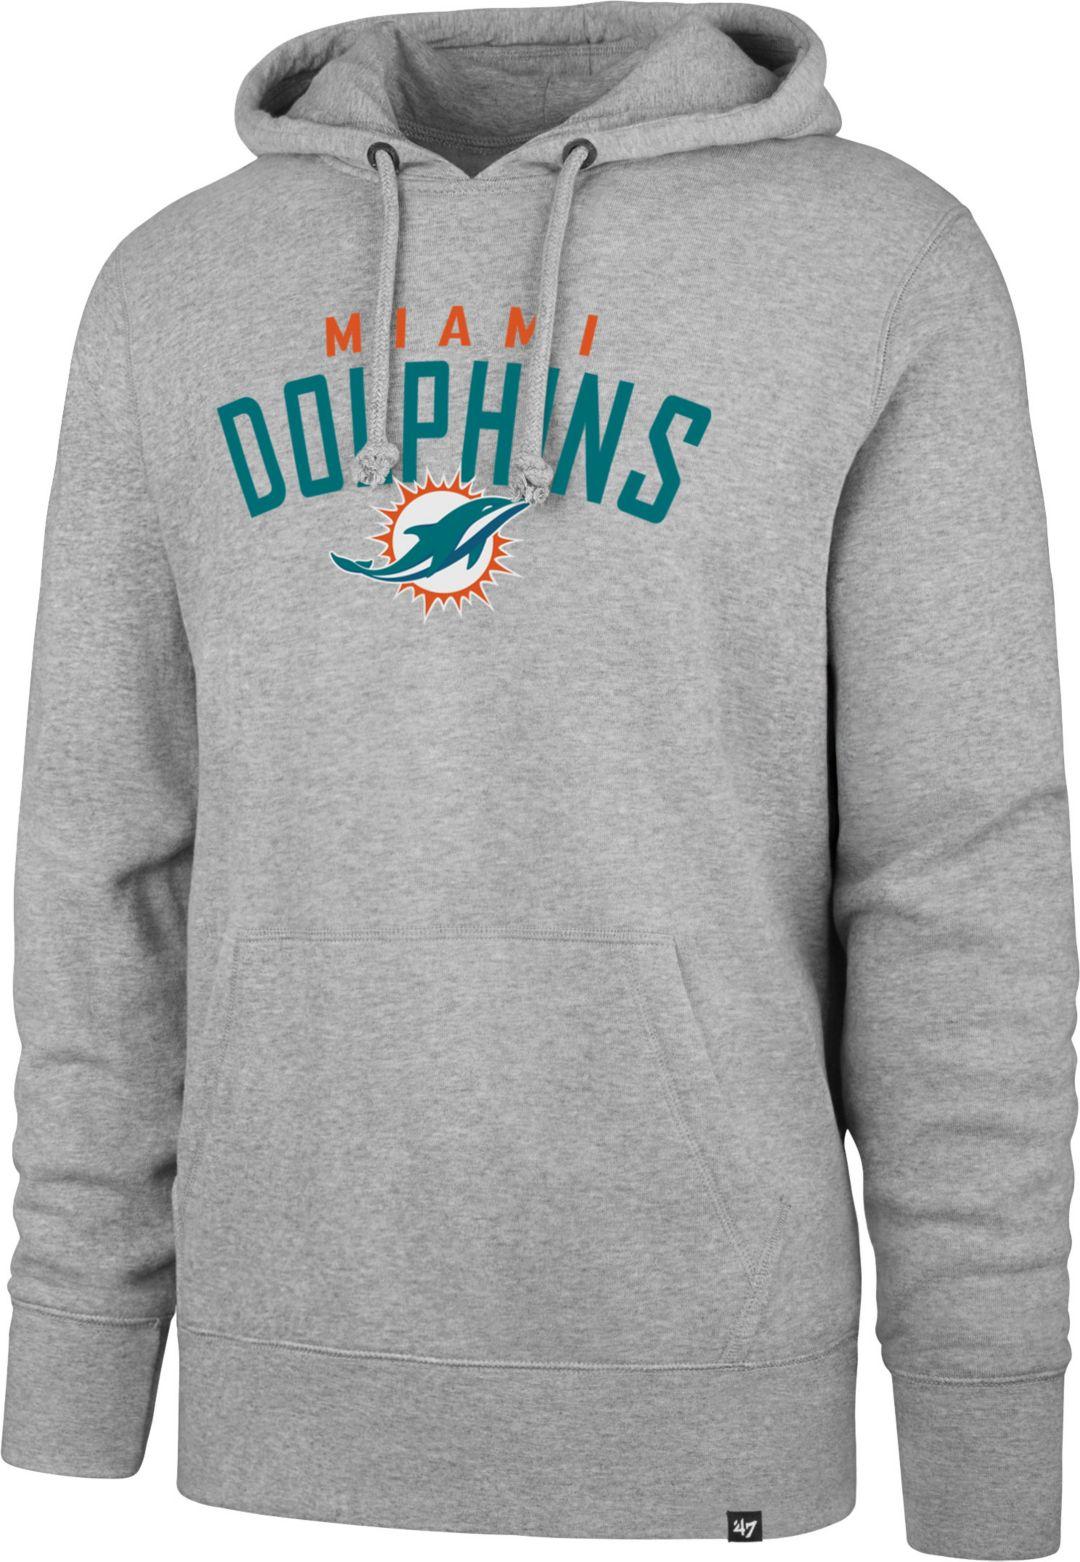 bd8ed4b6 '47 Men's Miami Dolphins Headline Grey Hoodie